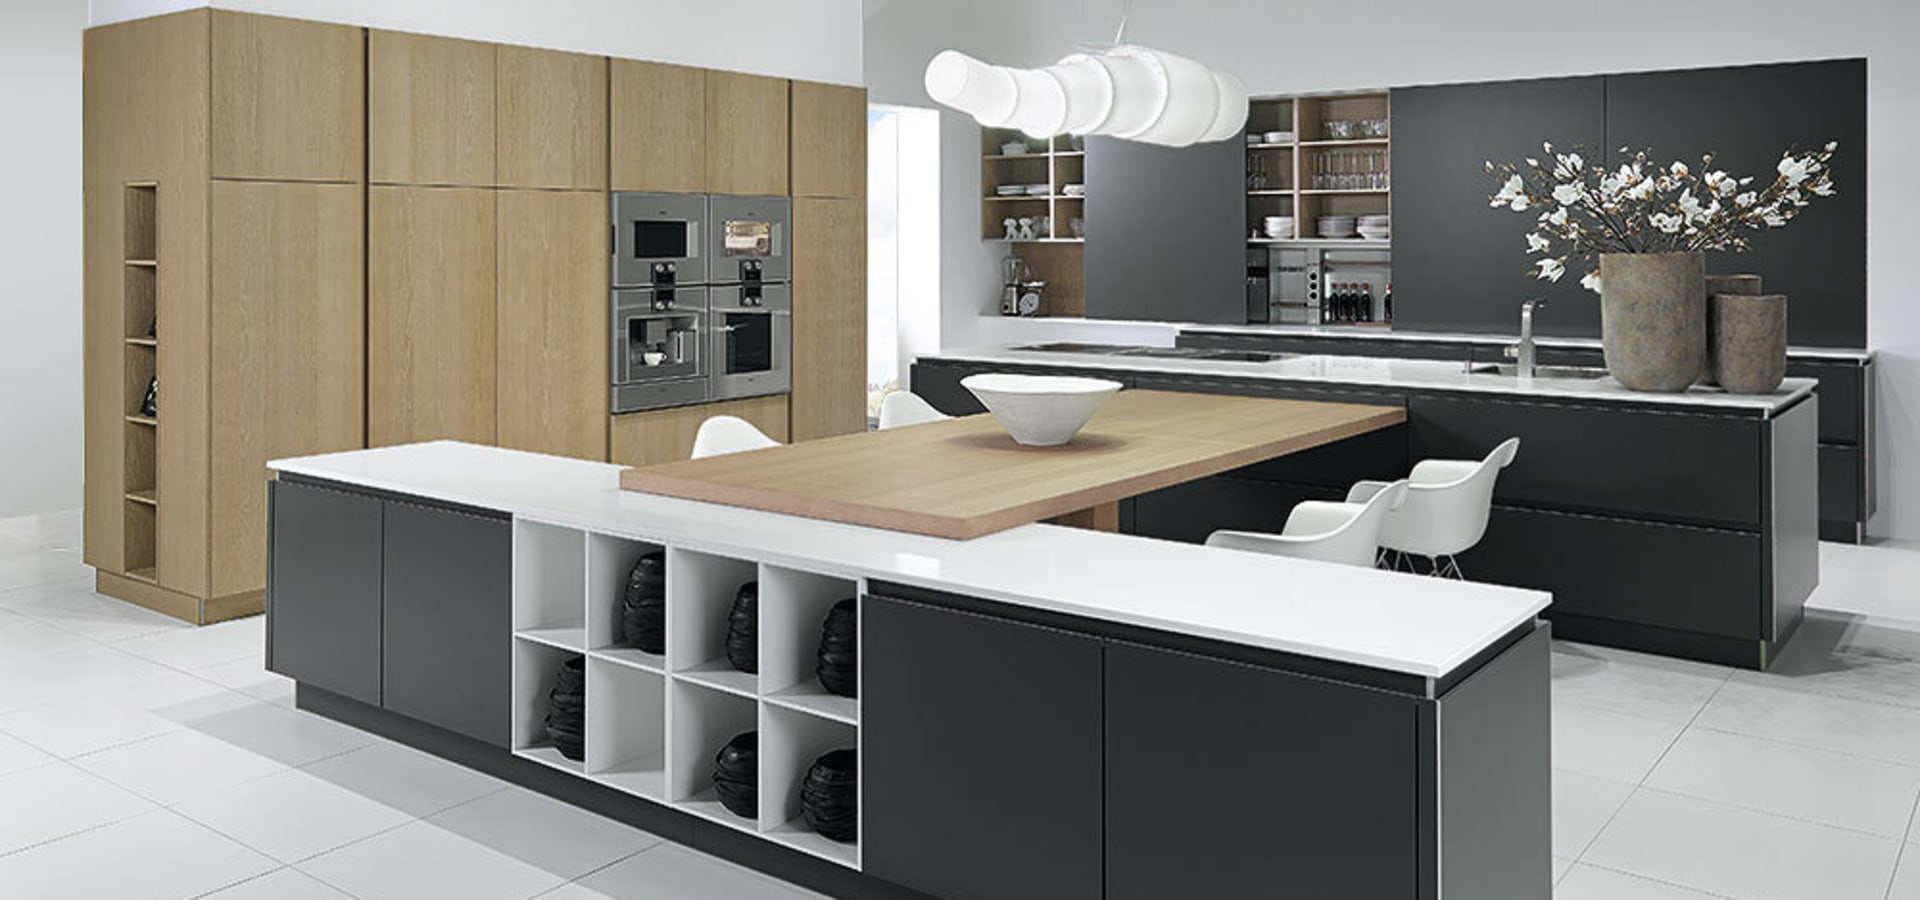 pronorm einbauk chen gmbh x line klassisch grifflos homify. Black Bedroom Furniture Sets. Home Design Ideas